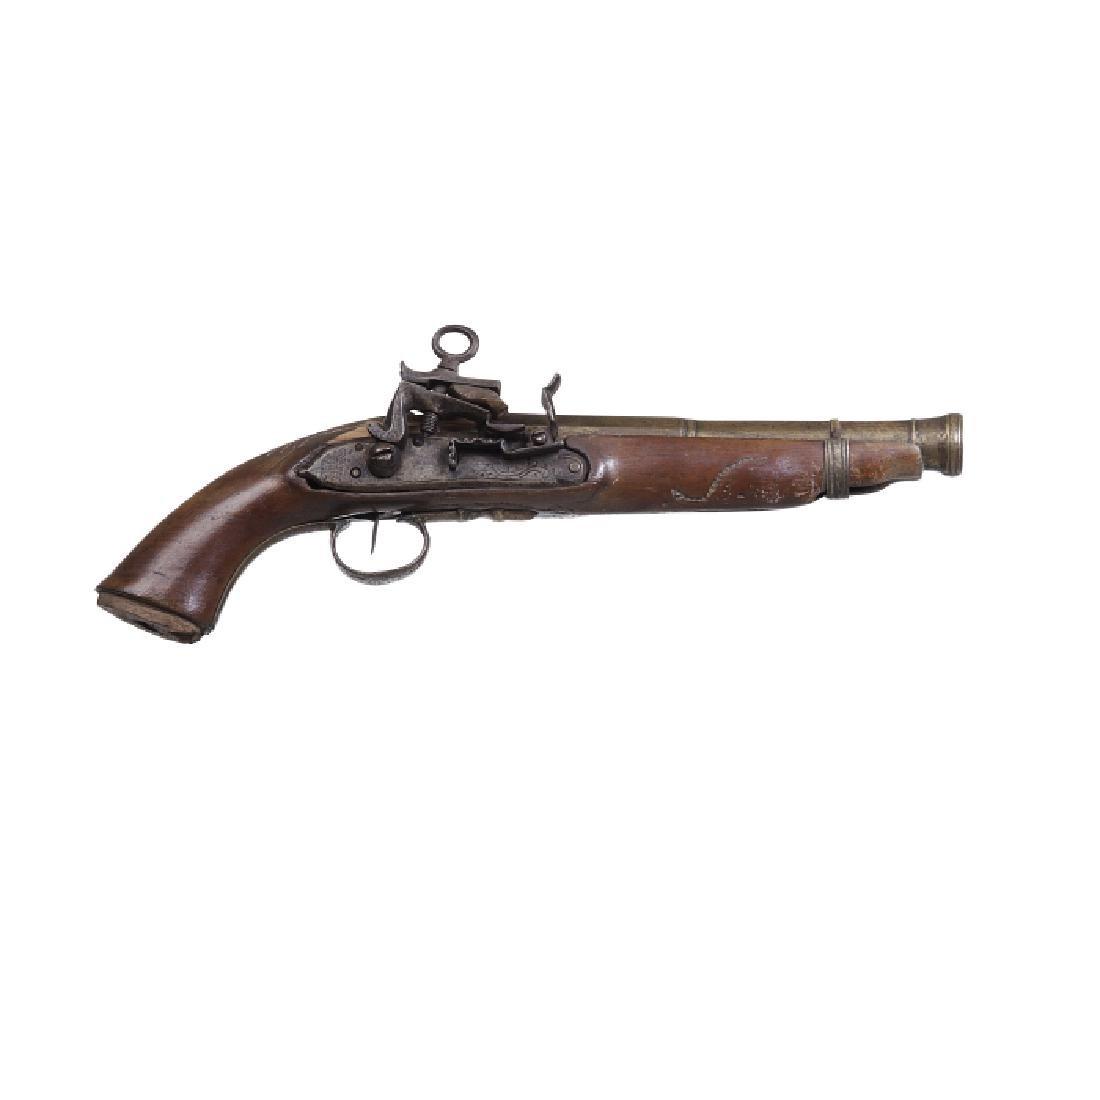 Portuguese flintlock pistol